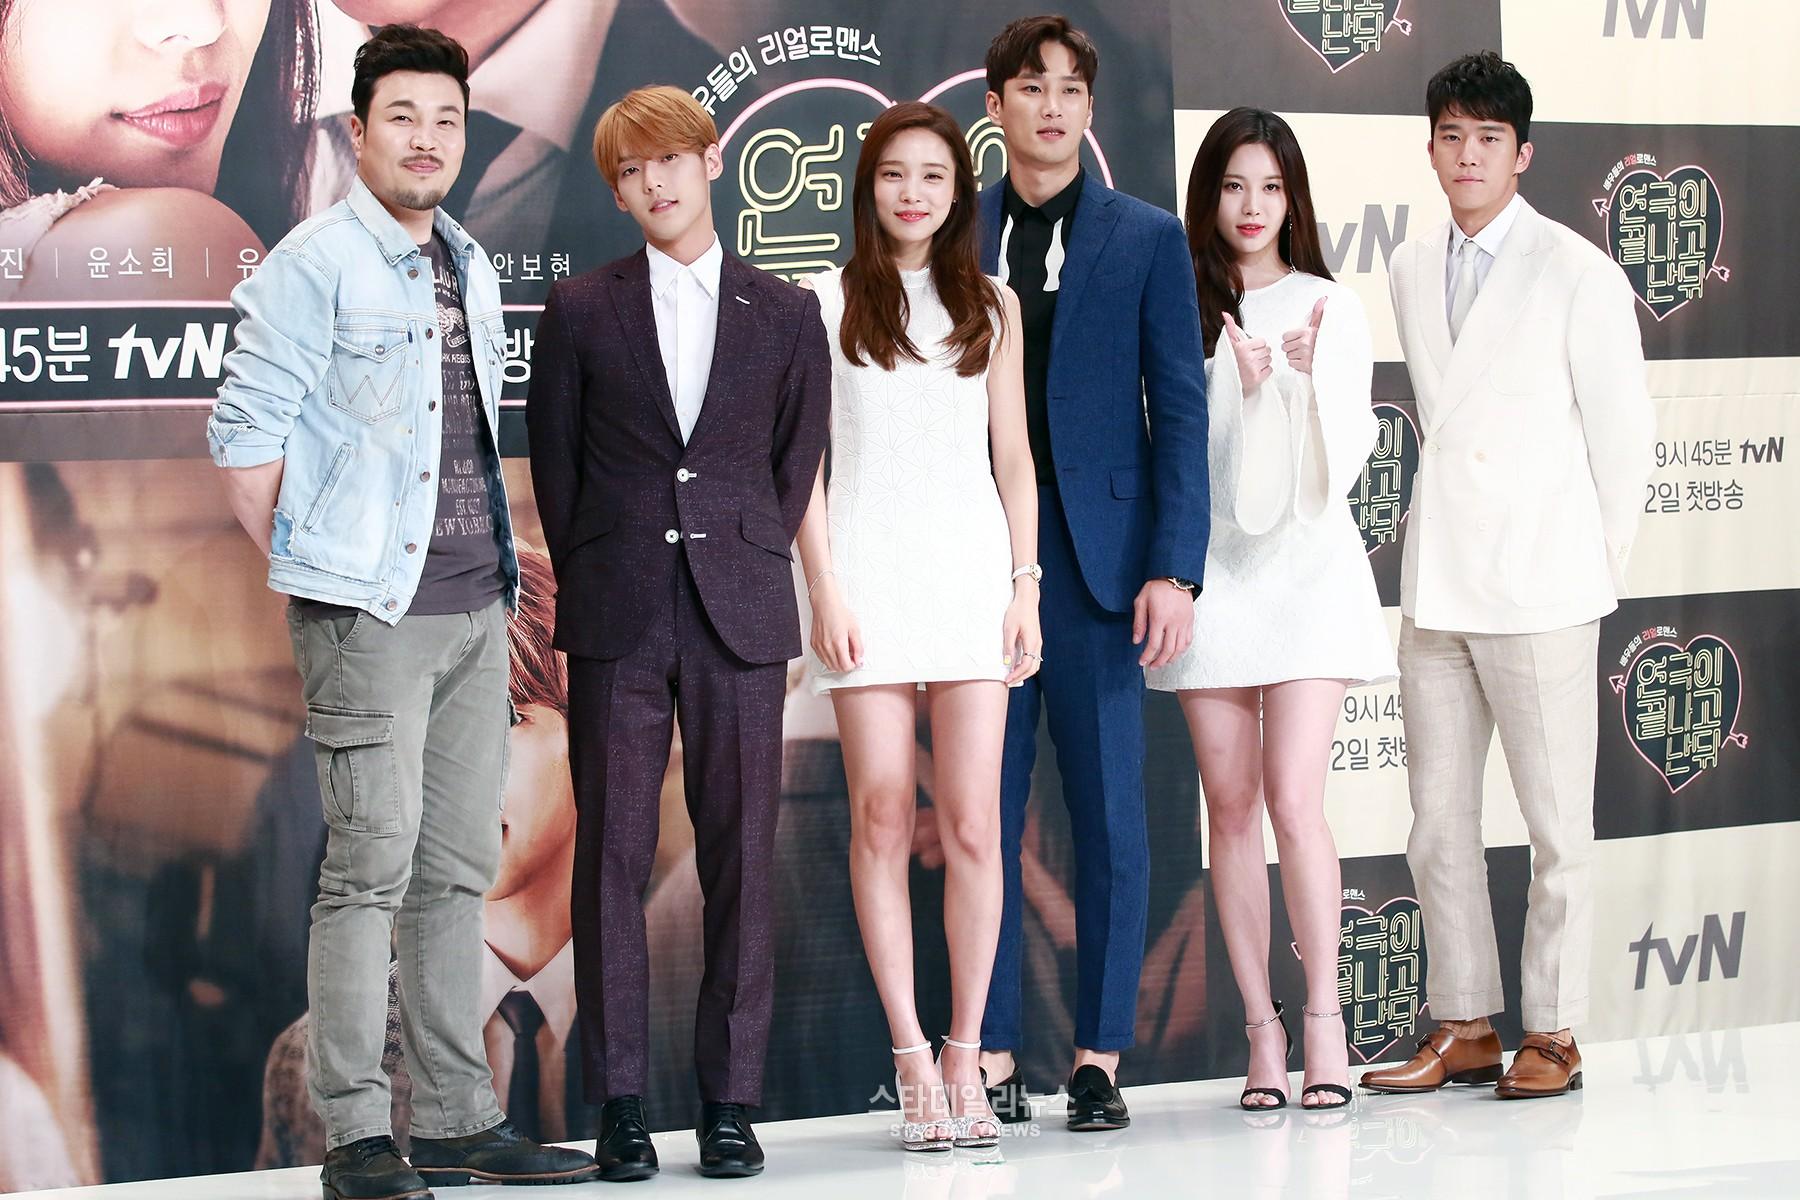 Co-Star Couples Such As Ahn Jae Hyun And Ku Hye Sun Inspire